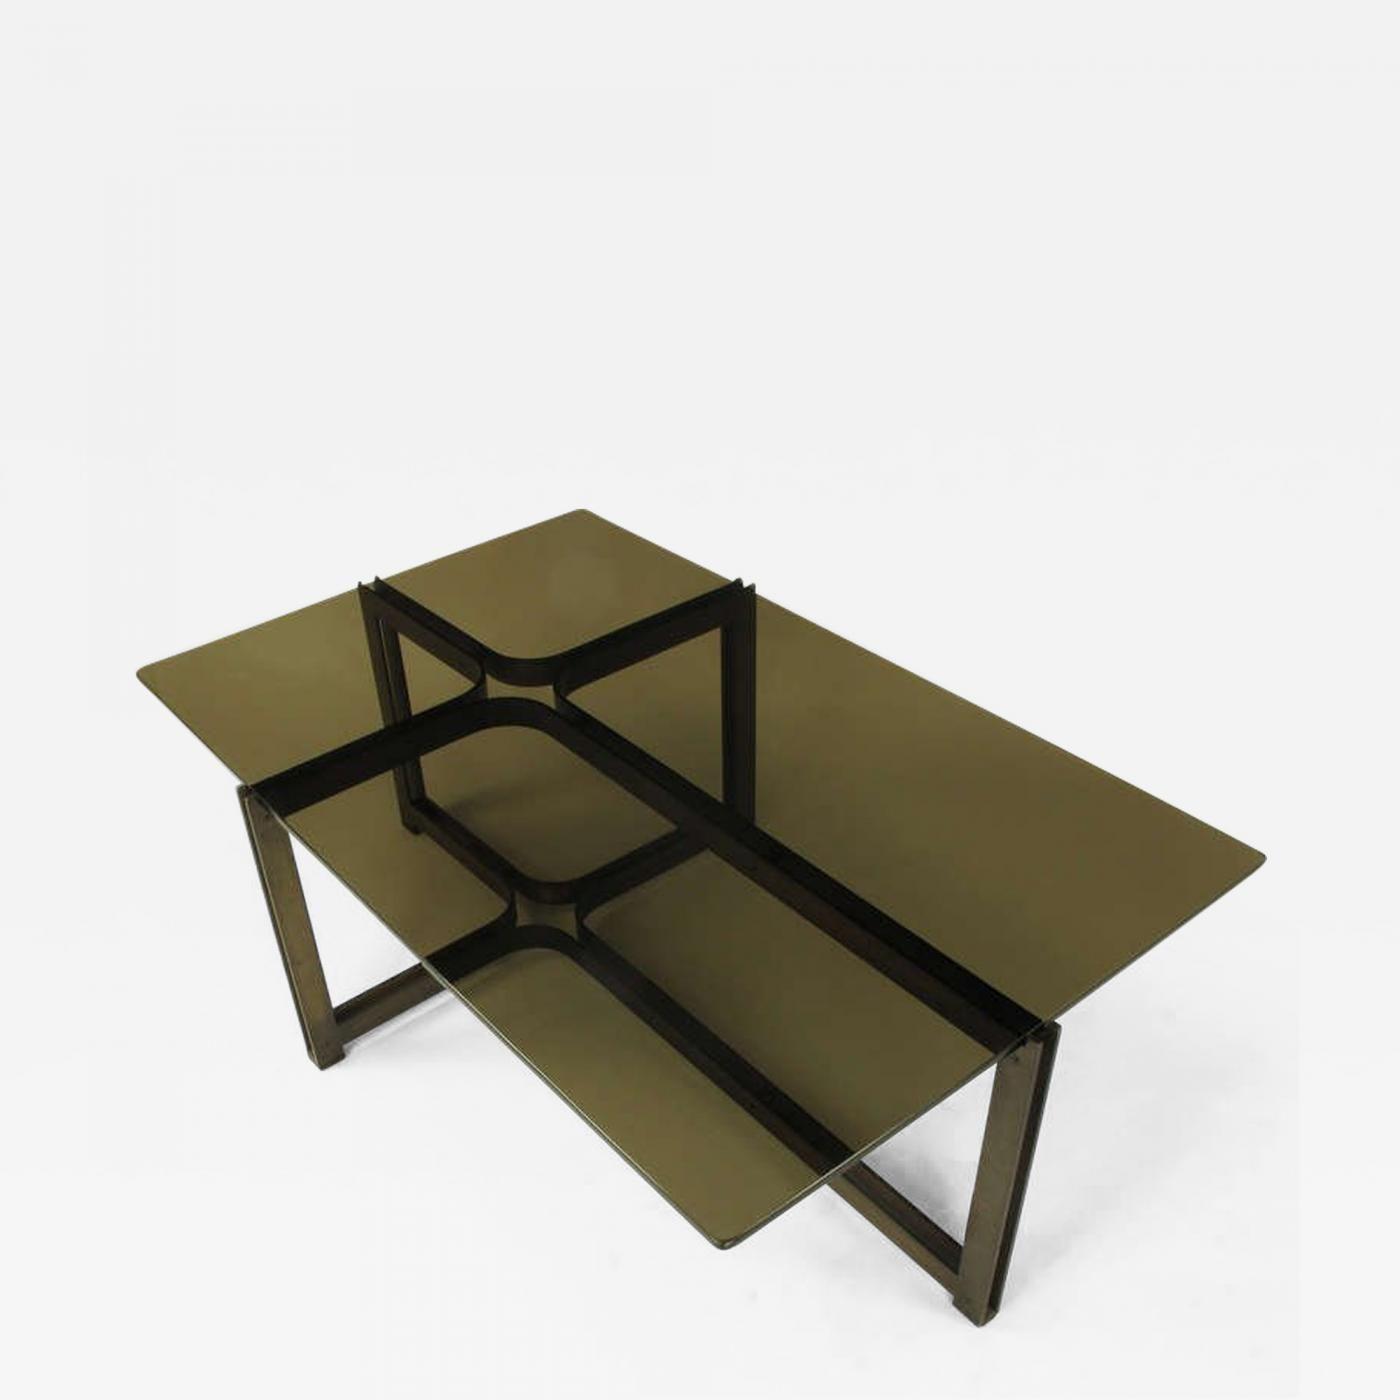 Dunbar Tom Lopinski For Dunbar Bronze Rosewood And Smoked Glass Coffee Table Smoked Glass Glass Coffee Table Coffee Table [ 1400 x 1400 Pixel ]